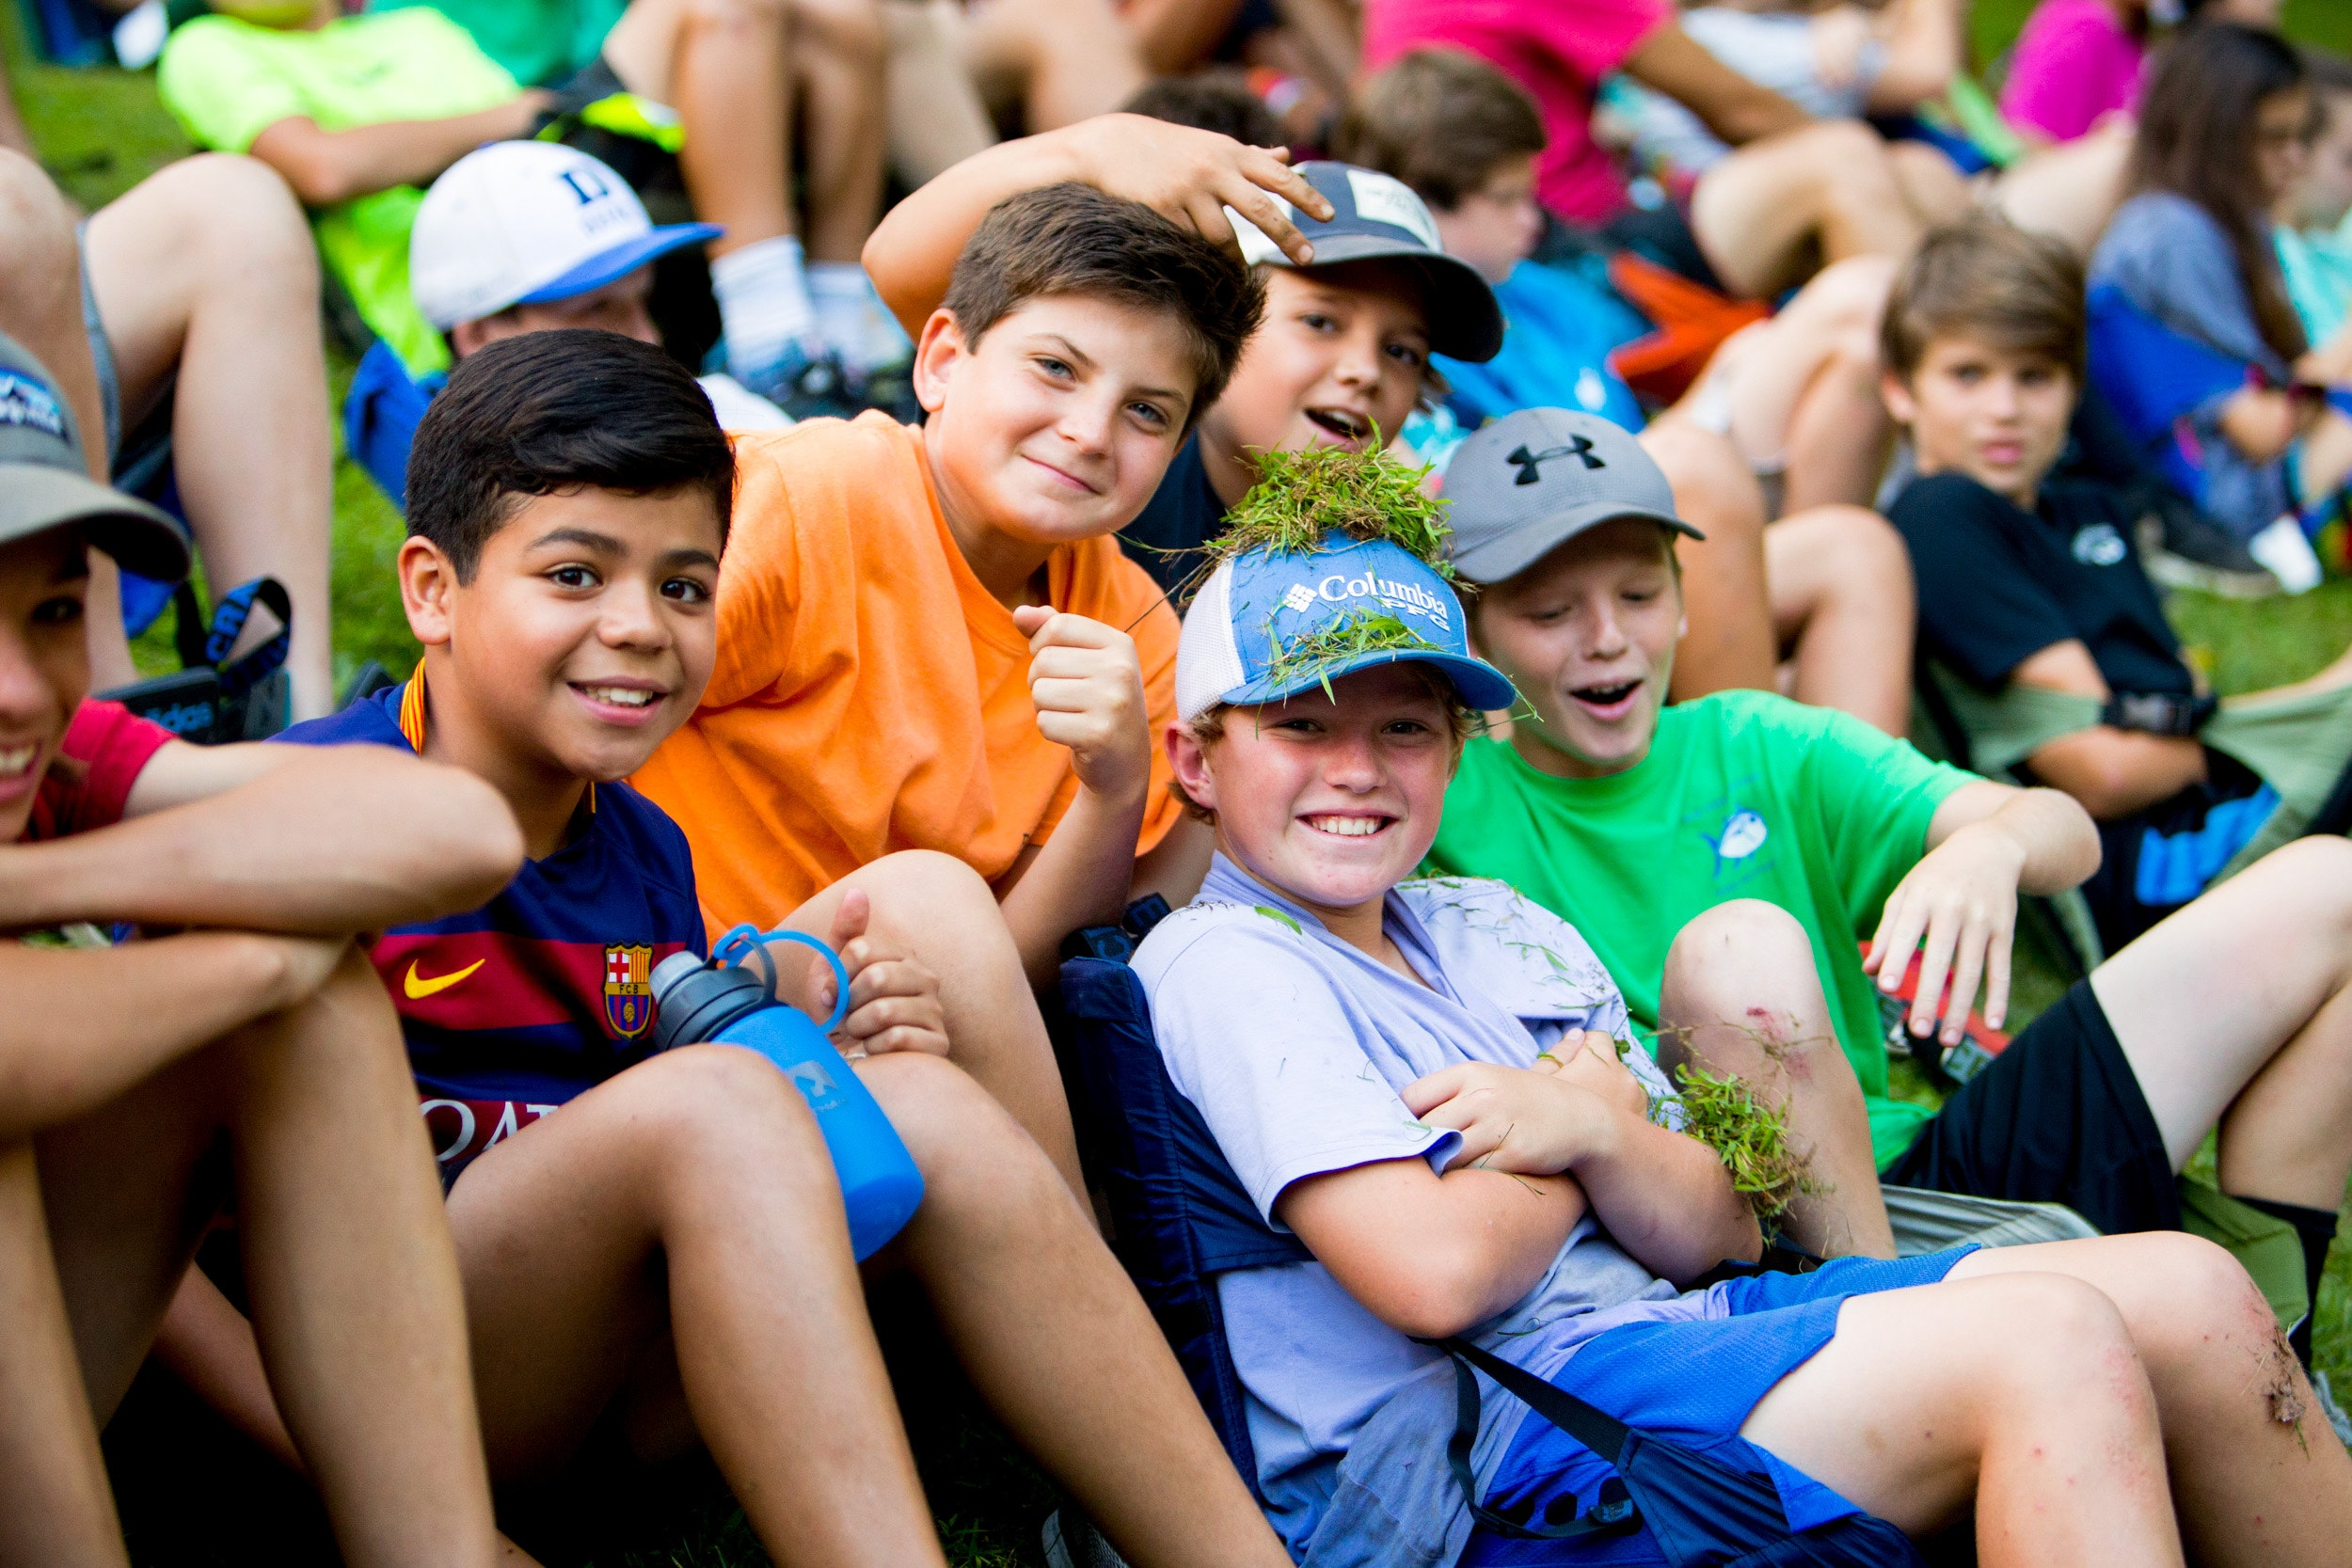 Boys camp at highlander summer camp for boys and girls in north carolina.jpg?ixlib=rails 2.1